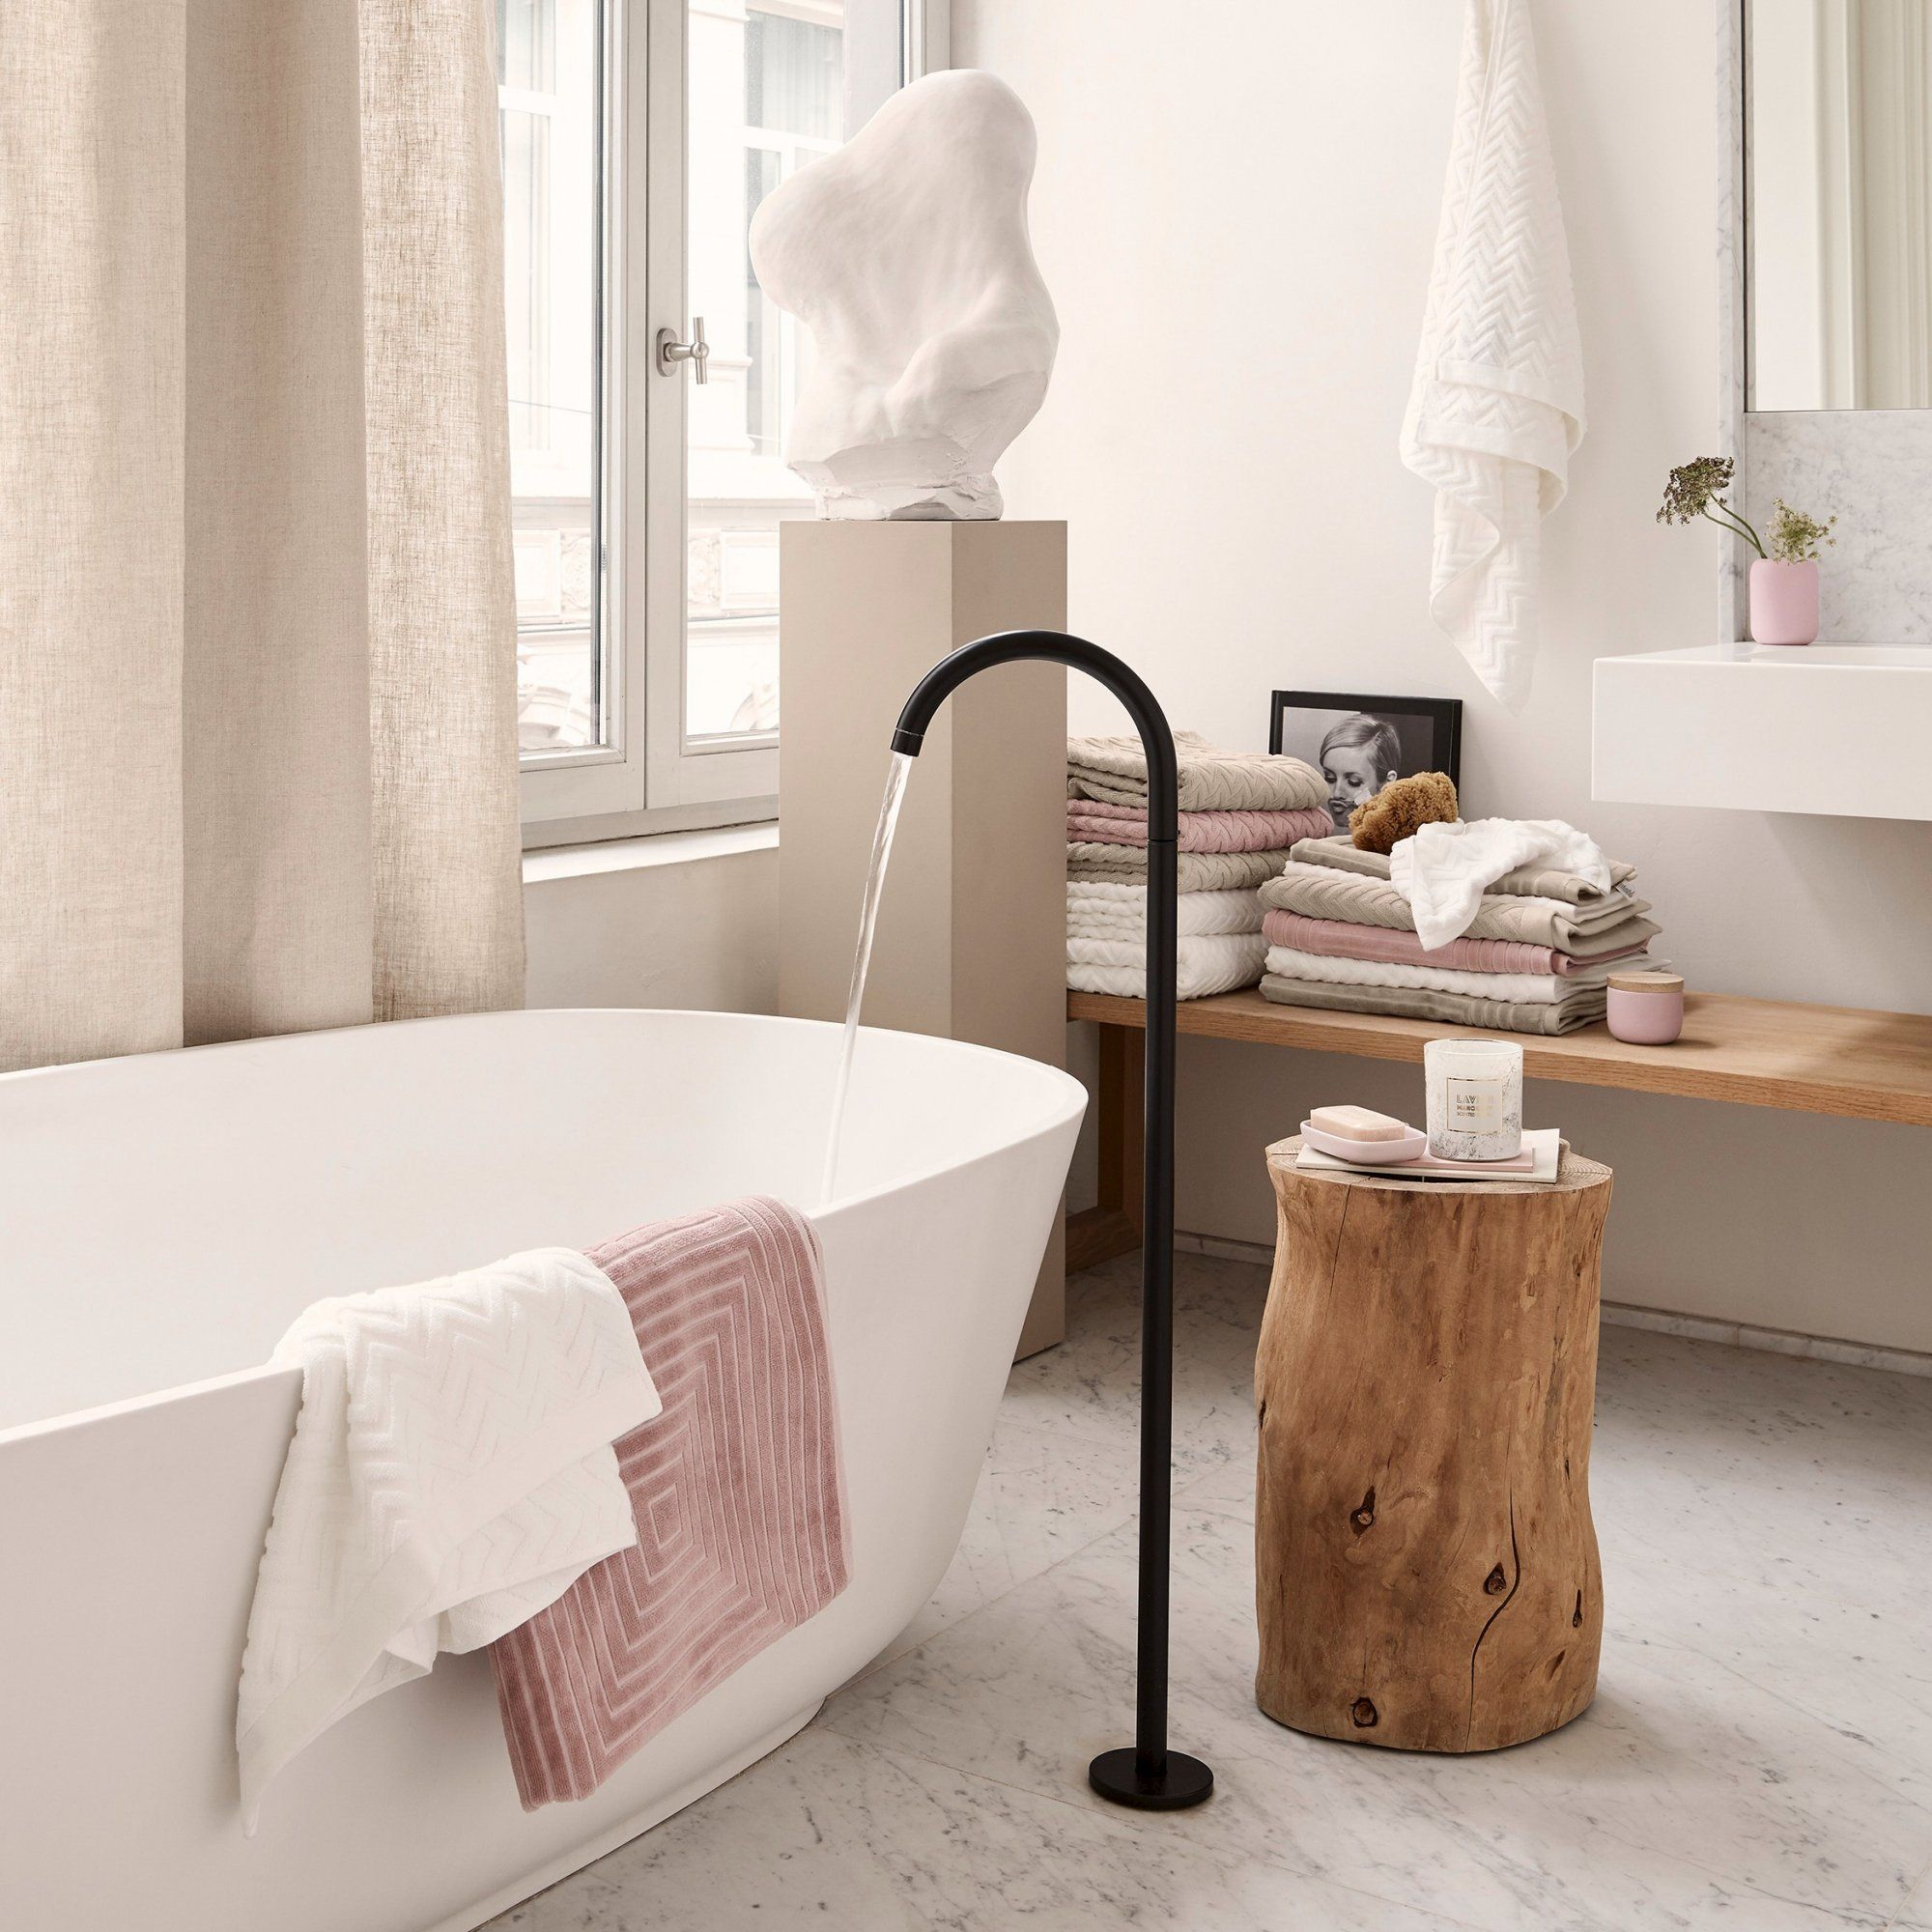 Rhinov Salle De Bain ~ une salle de bains pur e style nordique pinterest purer